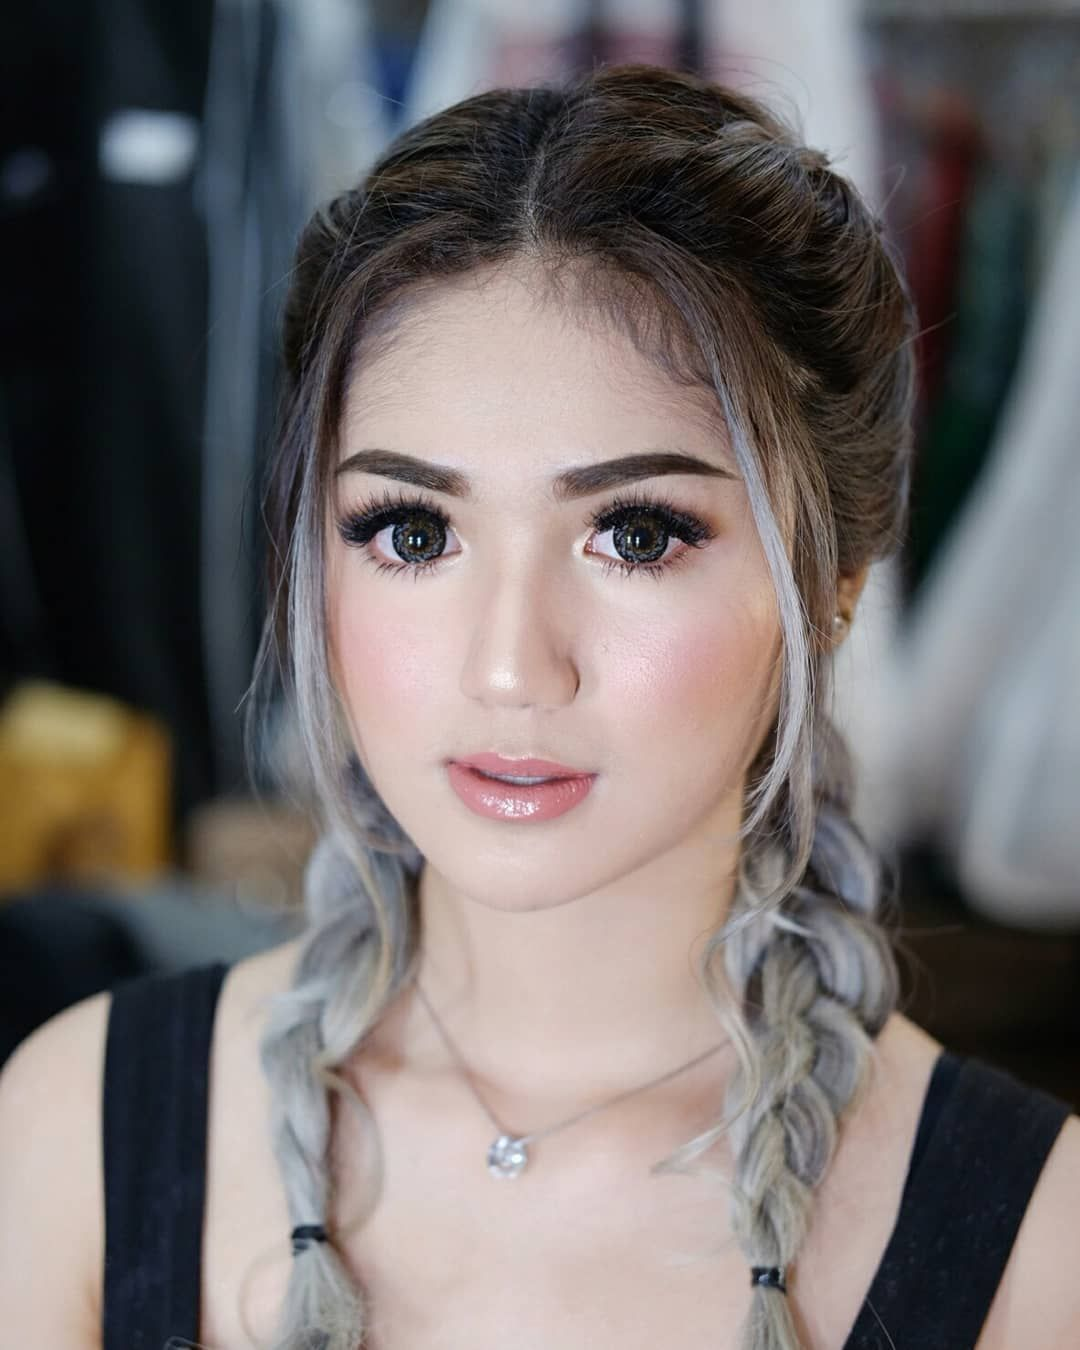 Barbie Hnxtasia She Use Eyelash Extension Hdo Fitri Nov Hairstylist Mua Muasemaranghits Muasemaran Wedding Day Makeup Pre Wedding Makeup Flawless Makeup